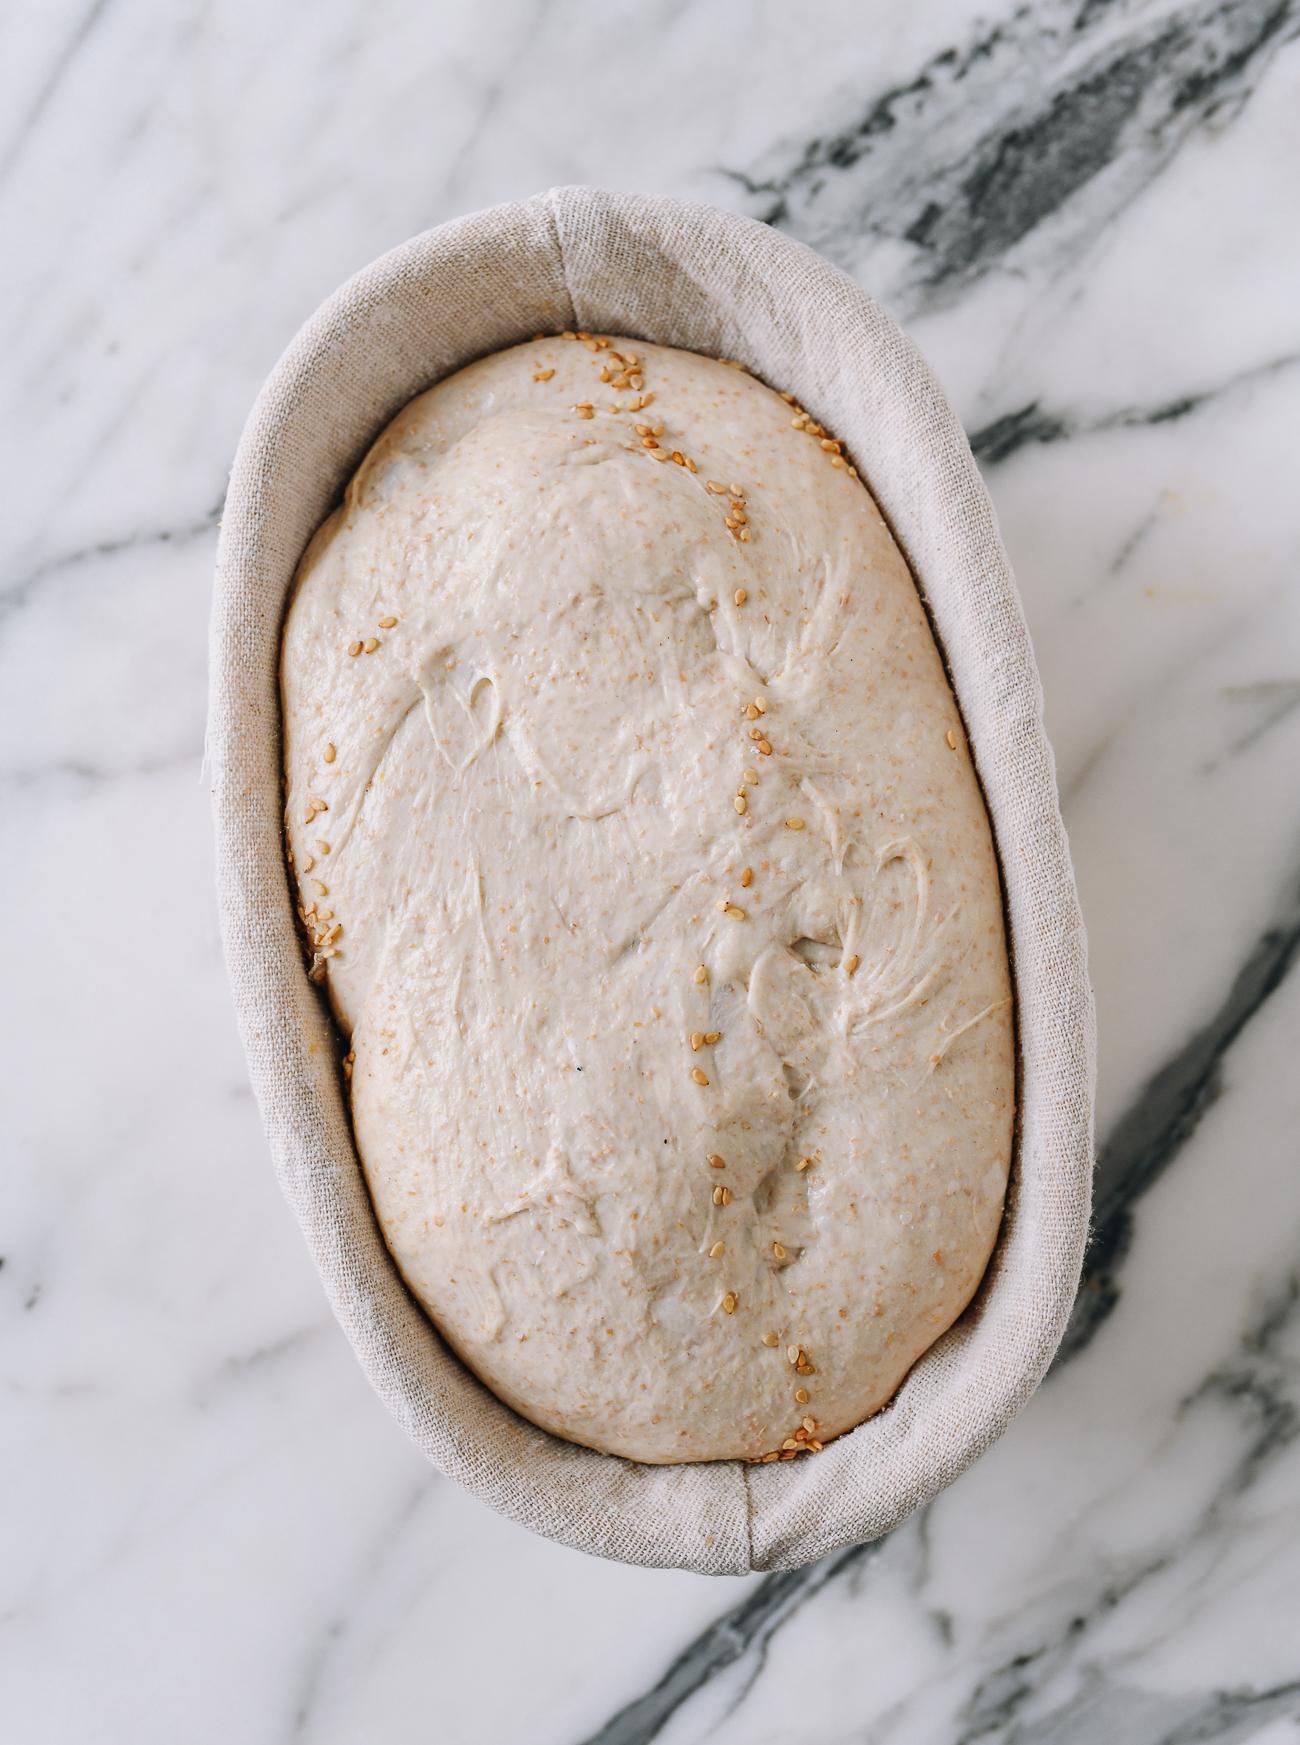 Sourdough in banneton after bulk fermentation